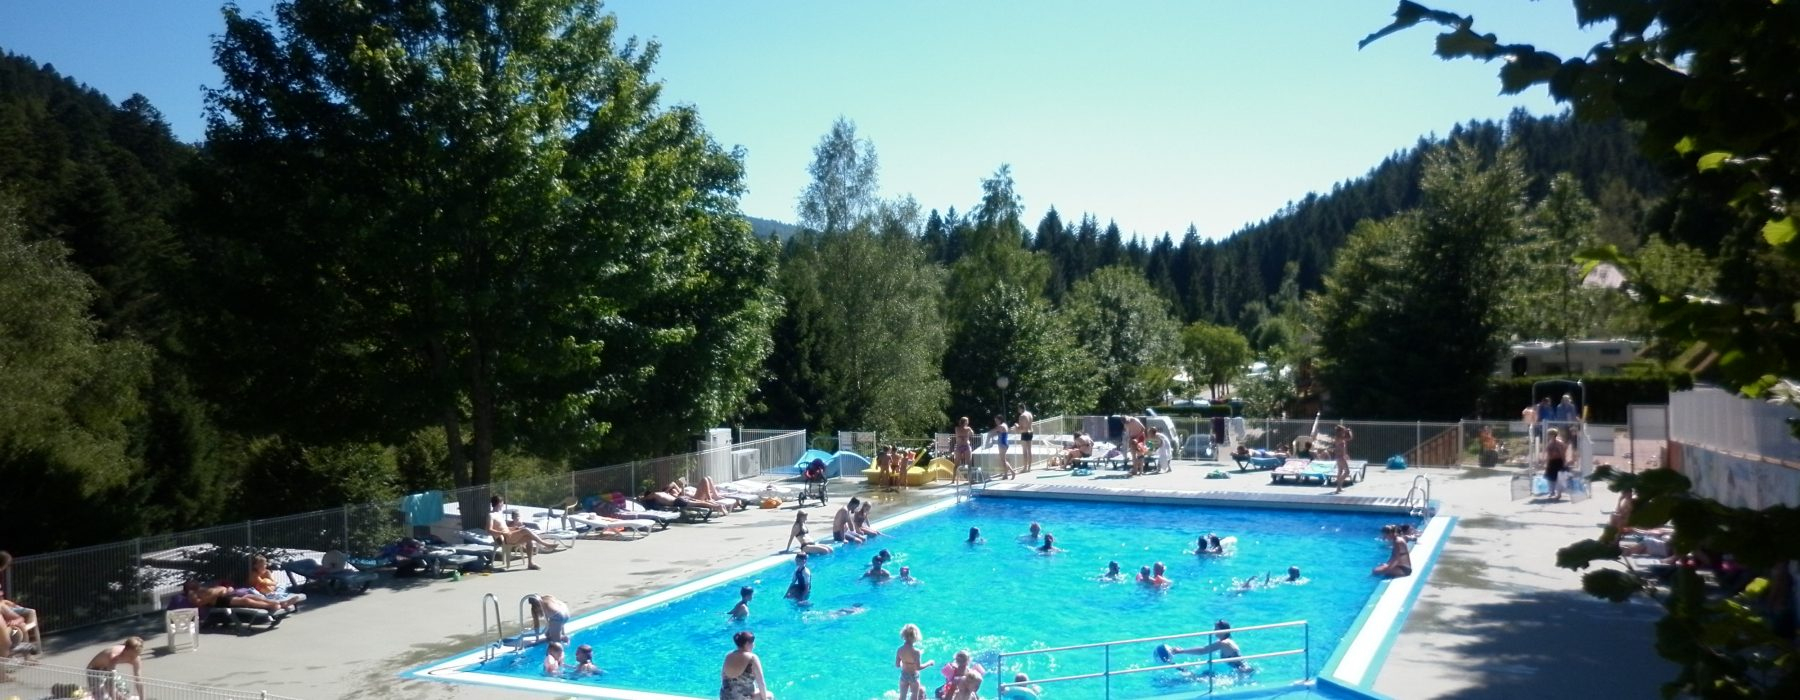 Swimming Pool Area | Camping Belle Hutte dedans Camping Gérardmer Avec Piscine